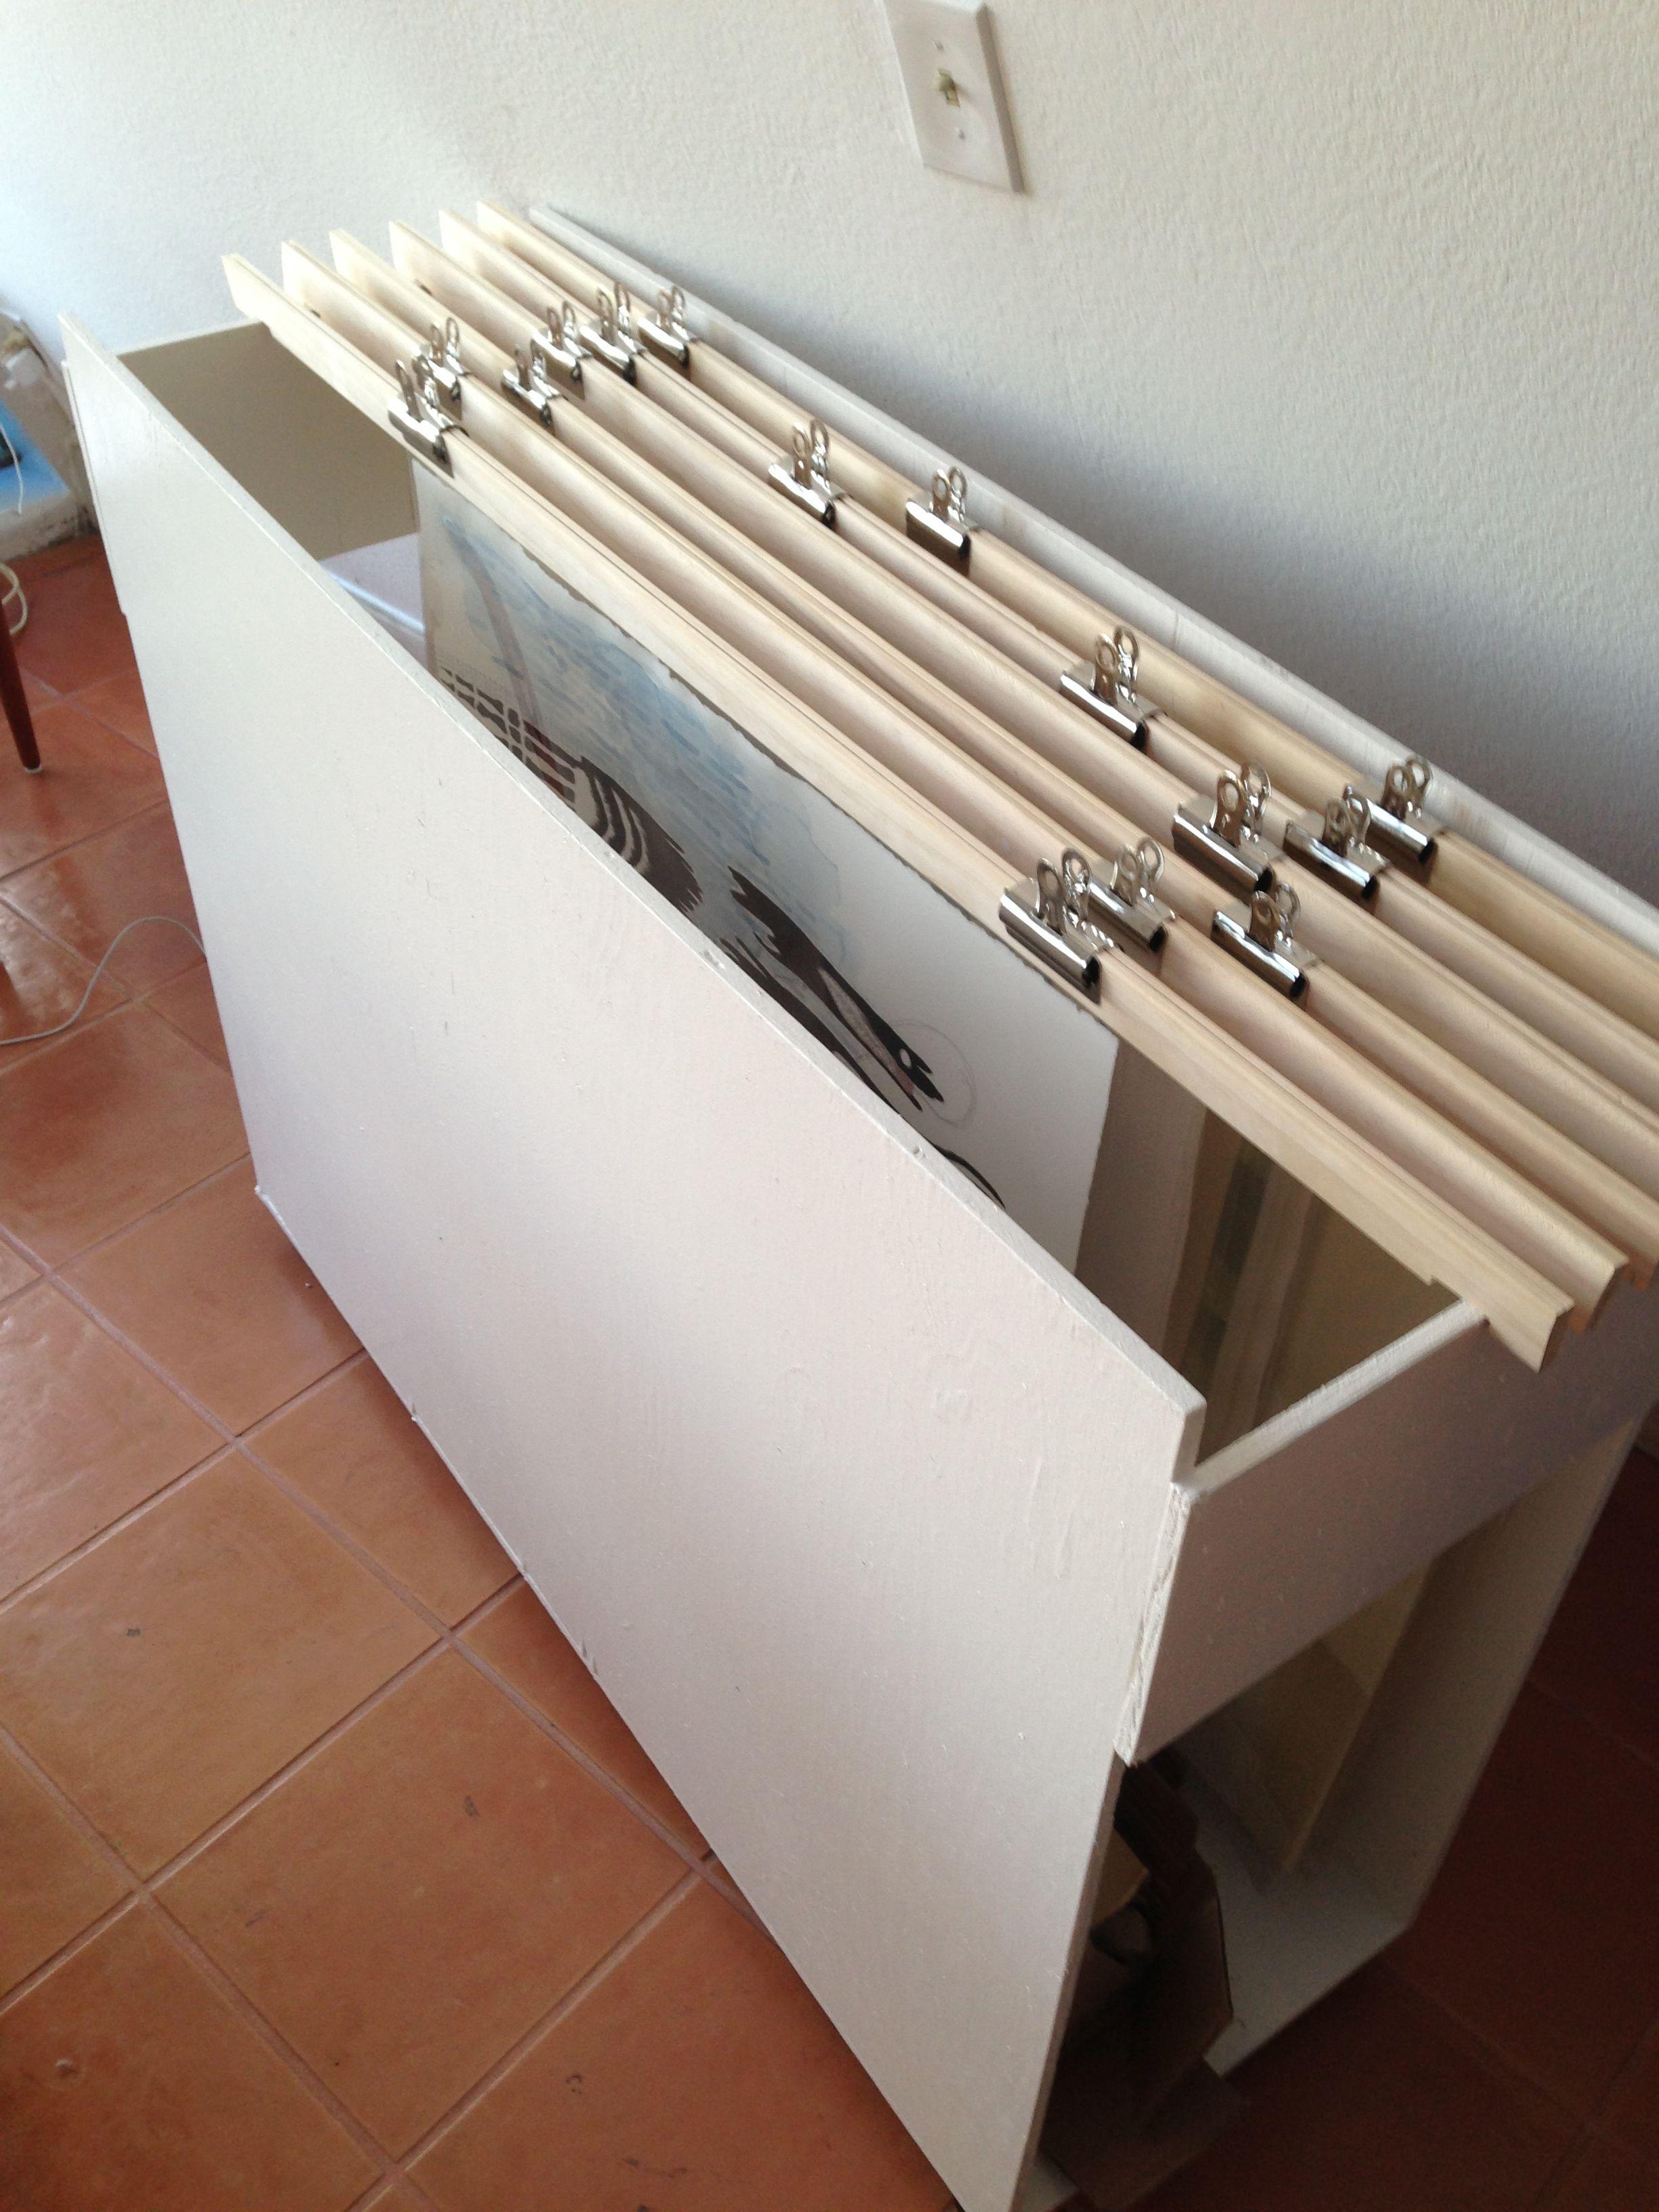 Mobile Art Storage Unit I Designed And Built Almacenamiento En